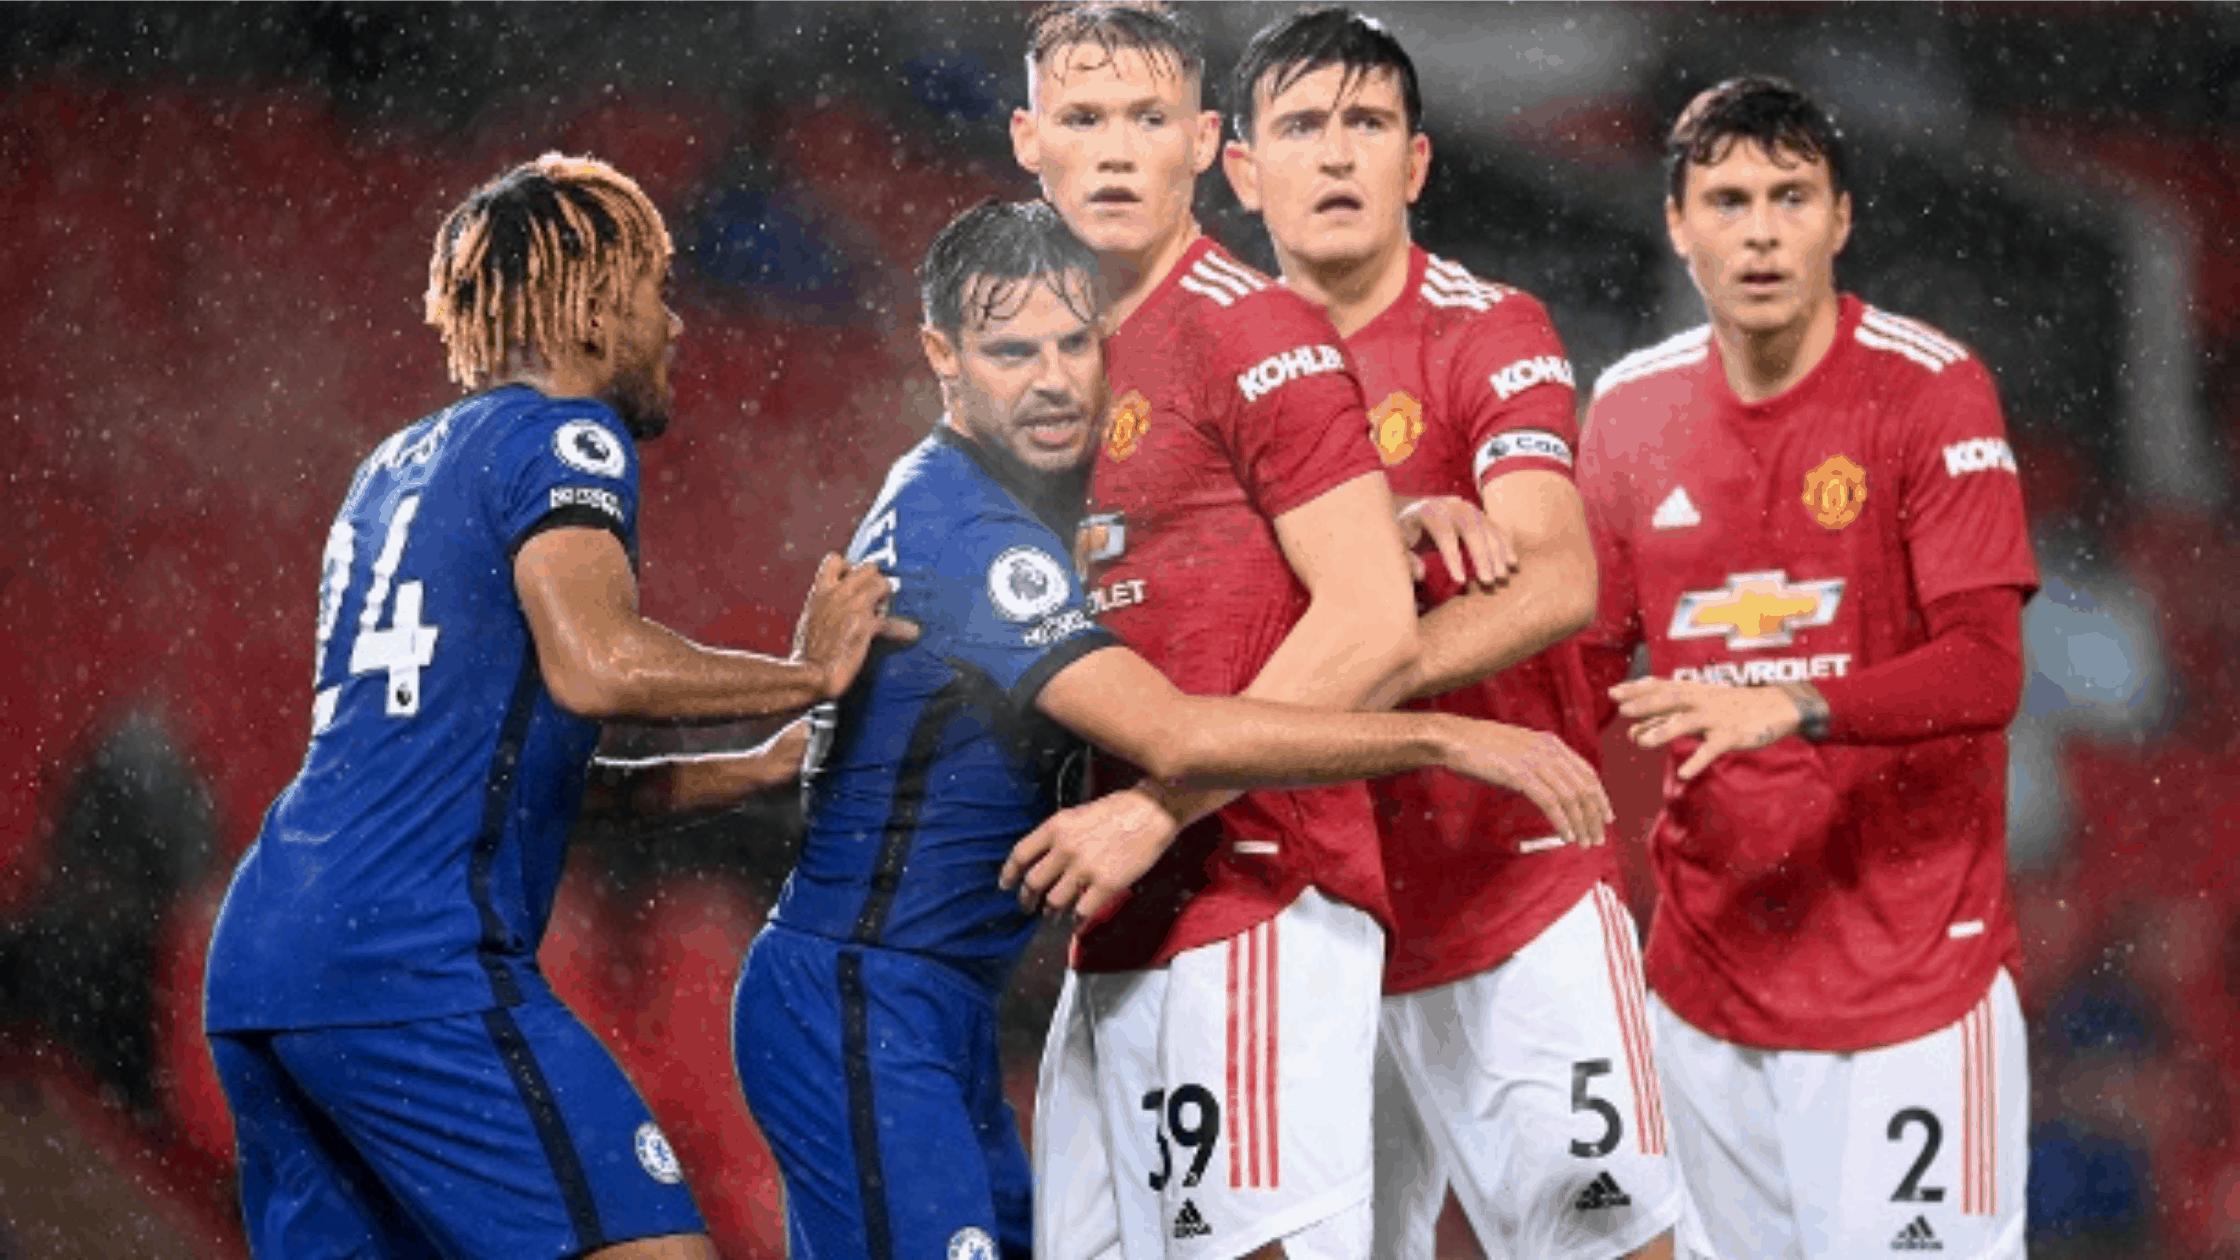 No winner between Manchester and Chelsea